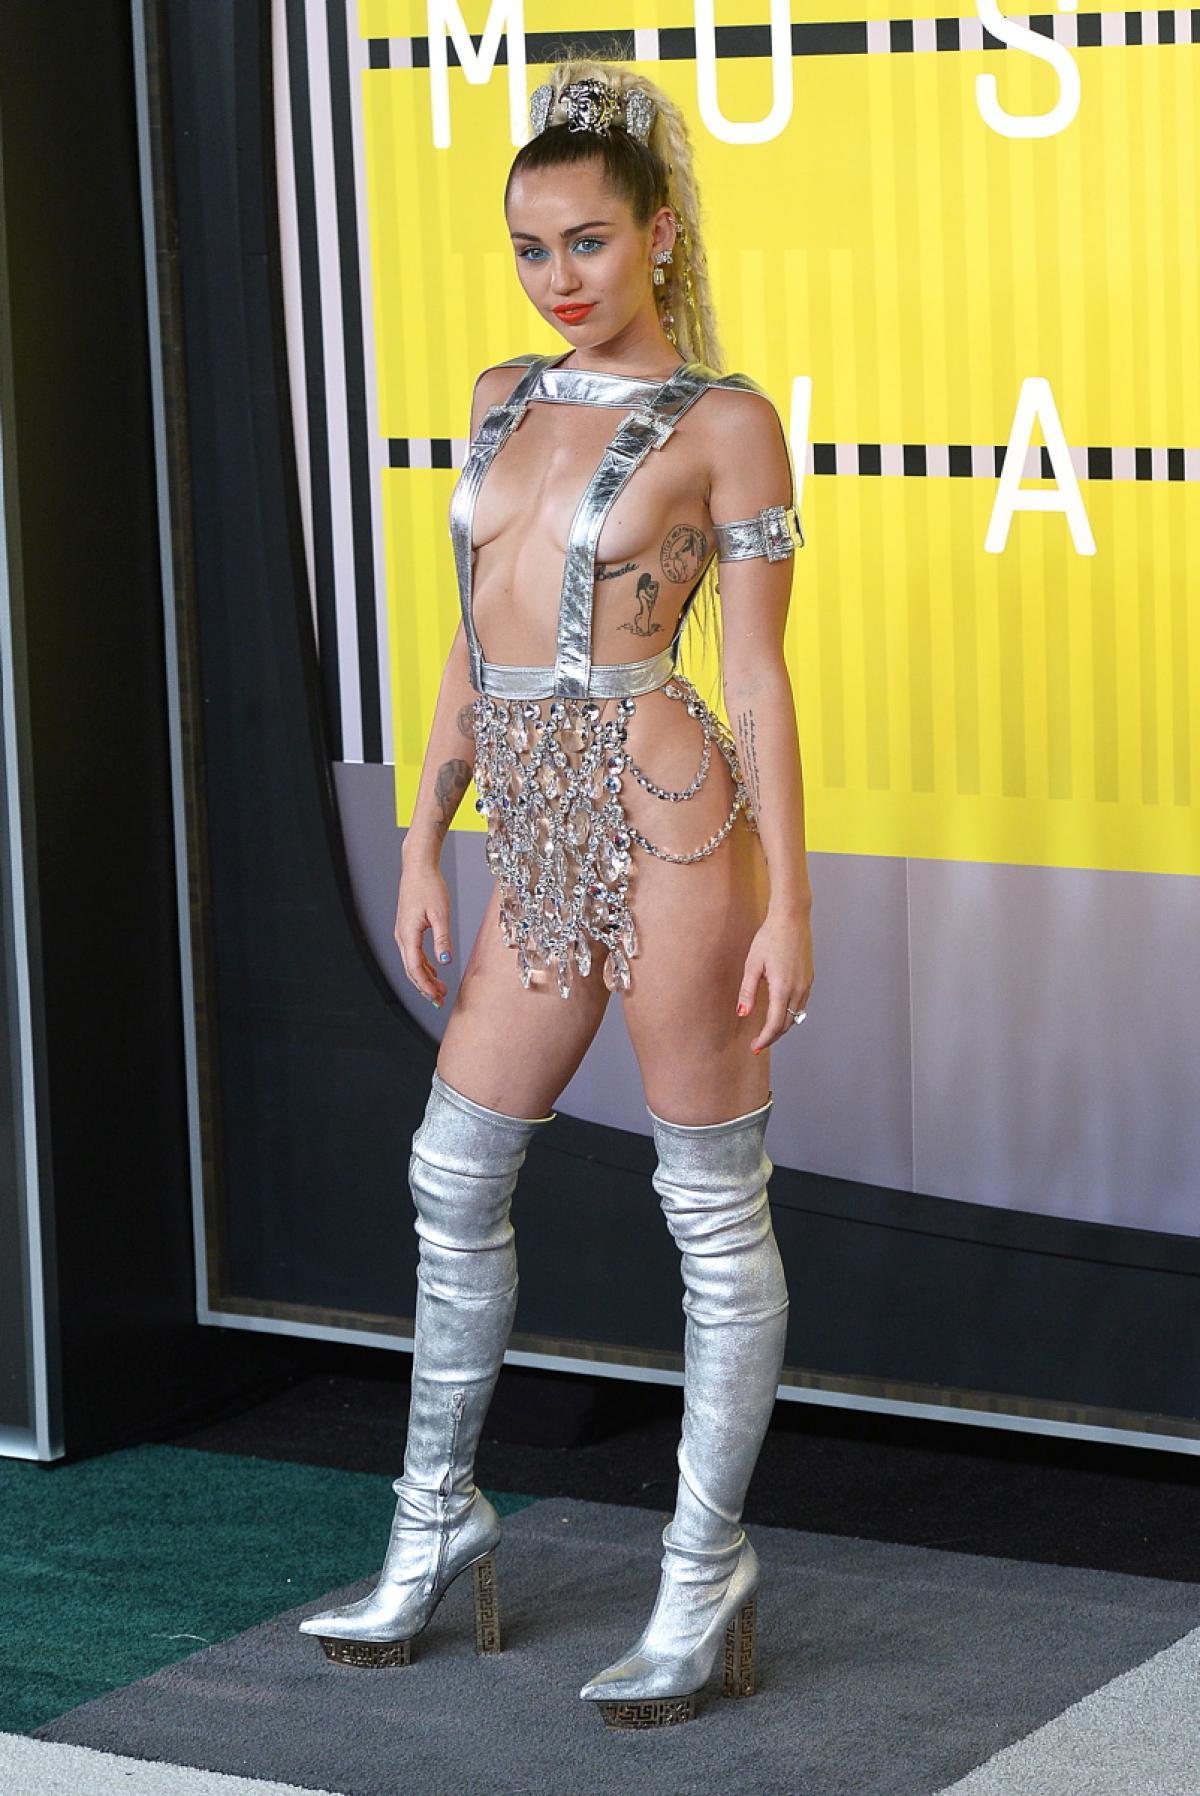 miley-cyrus-outfits-2015-vmas5.jpg